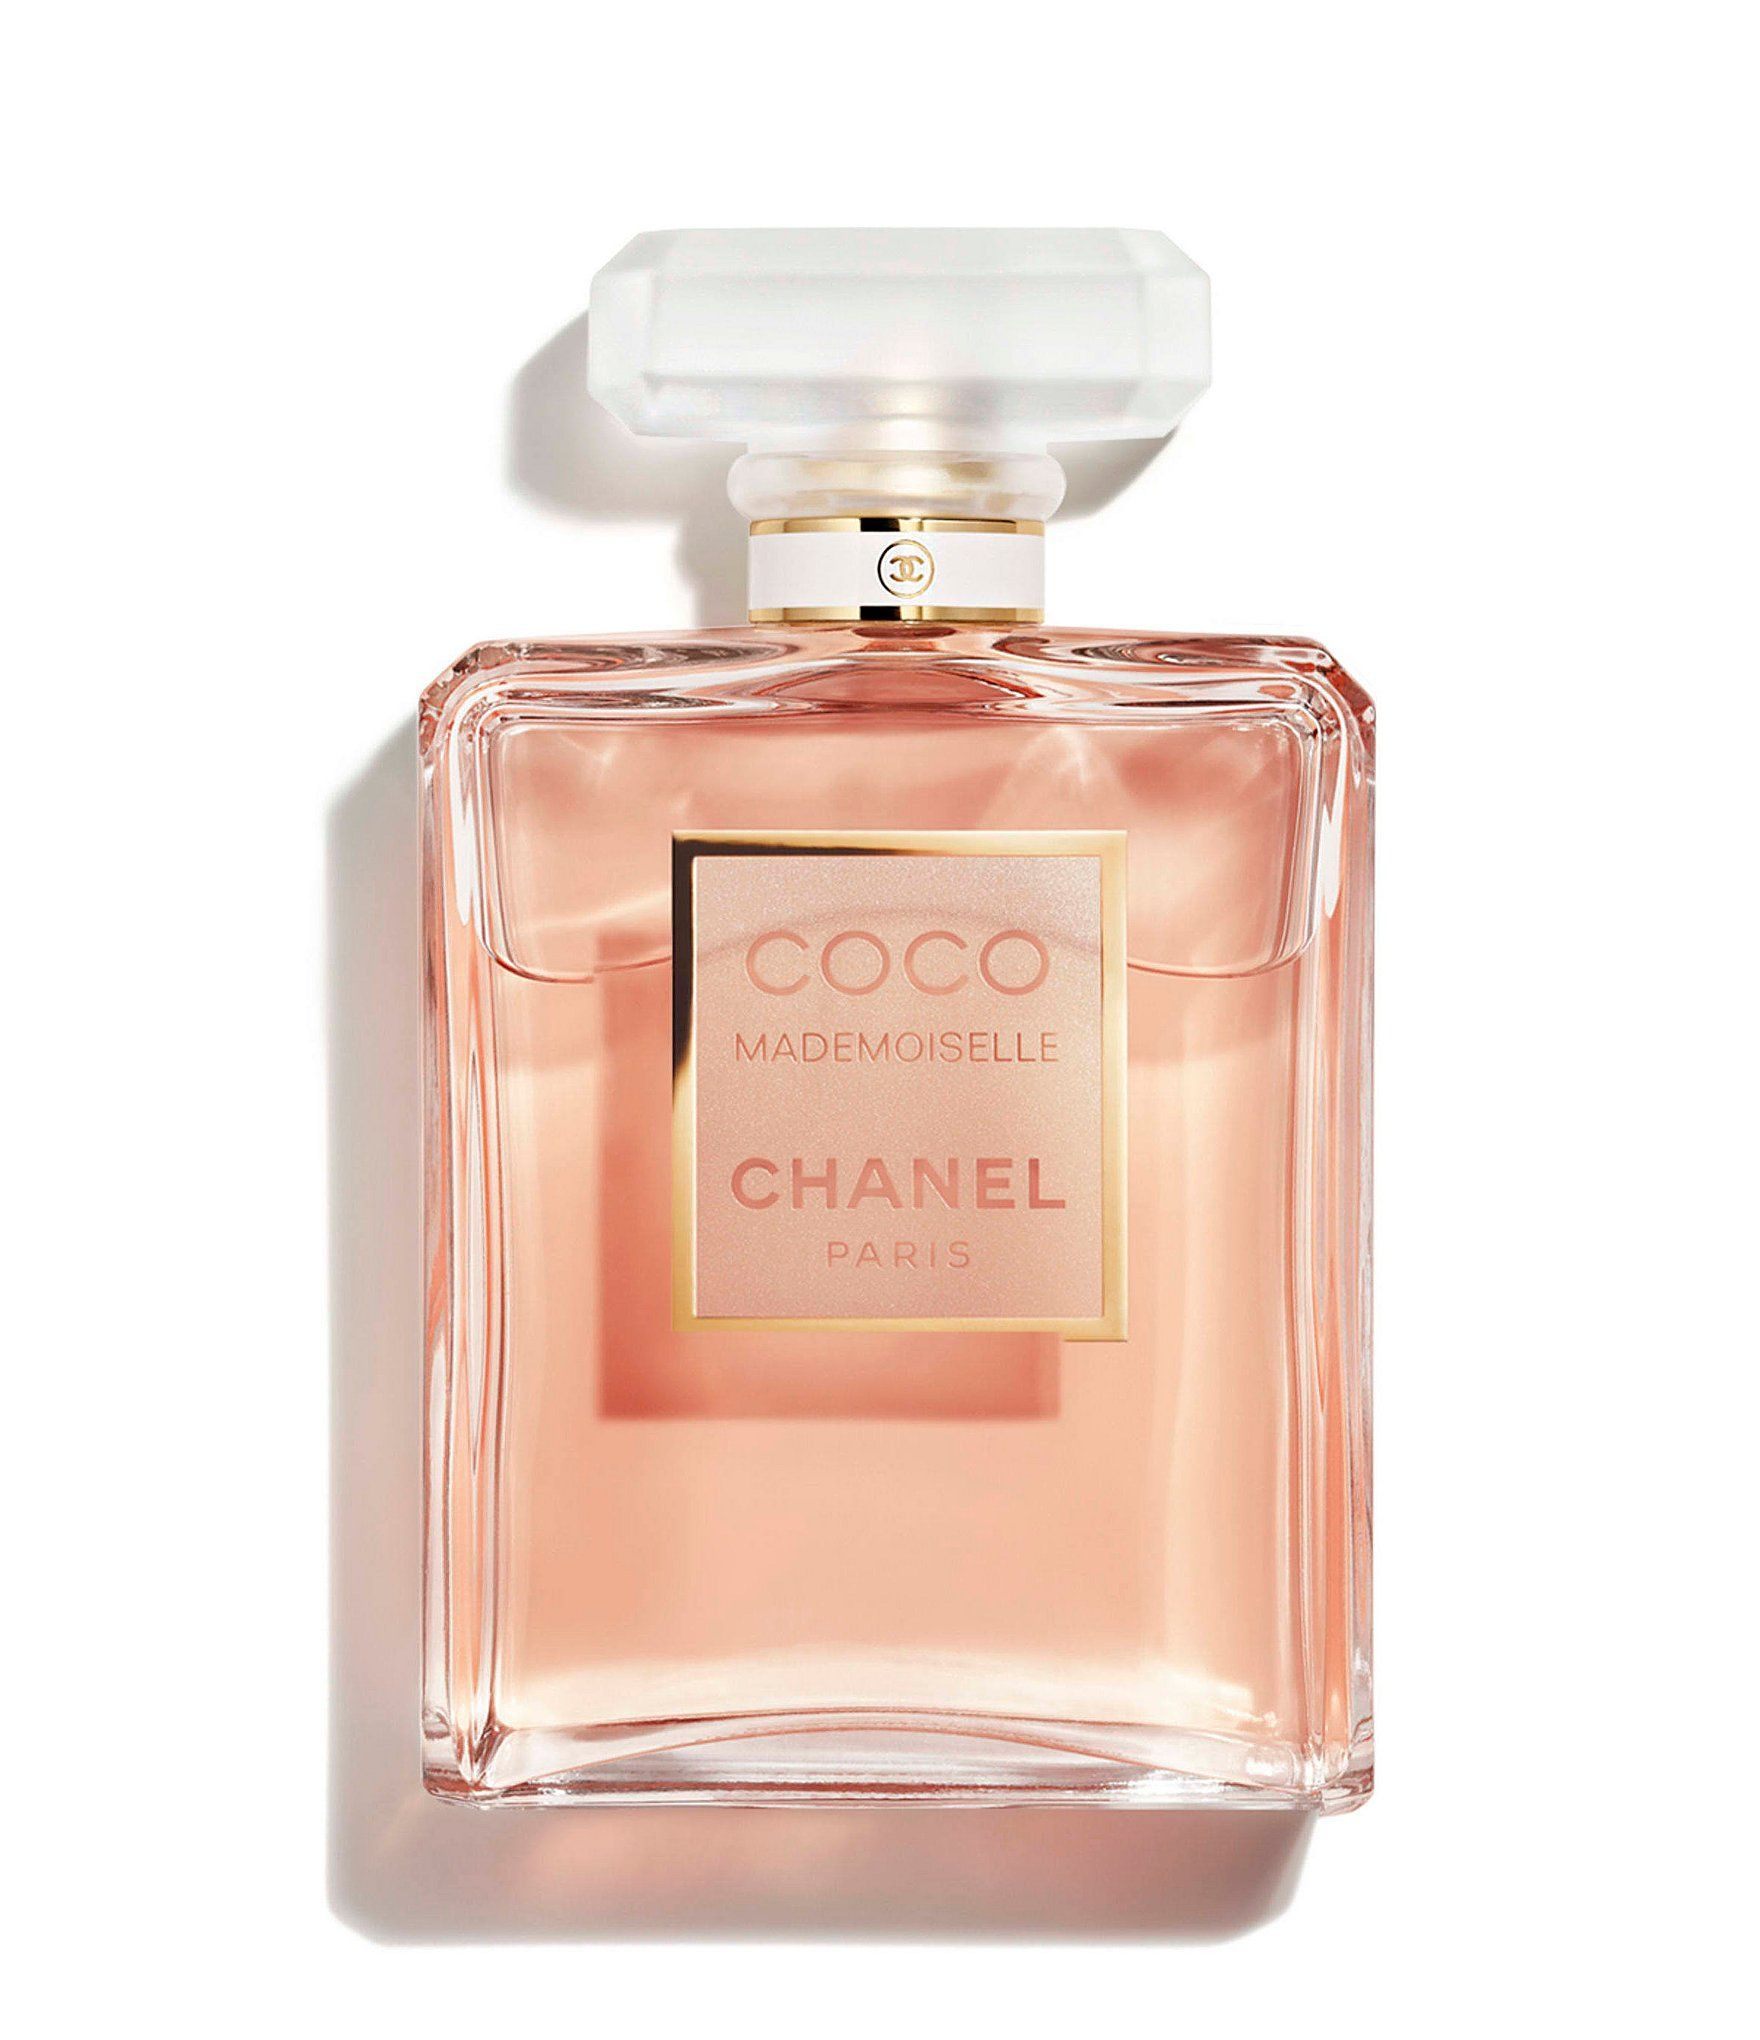 127149ea2 Shop for Chanel CHANEL COCO MADEMOISELLE EAU DE PARFUM SPRAY at  Dillards.com. Visit Dillards.com to find clothing, accessories, shoes,  cosmetics & more.